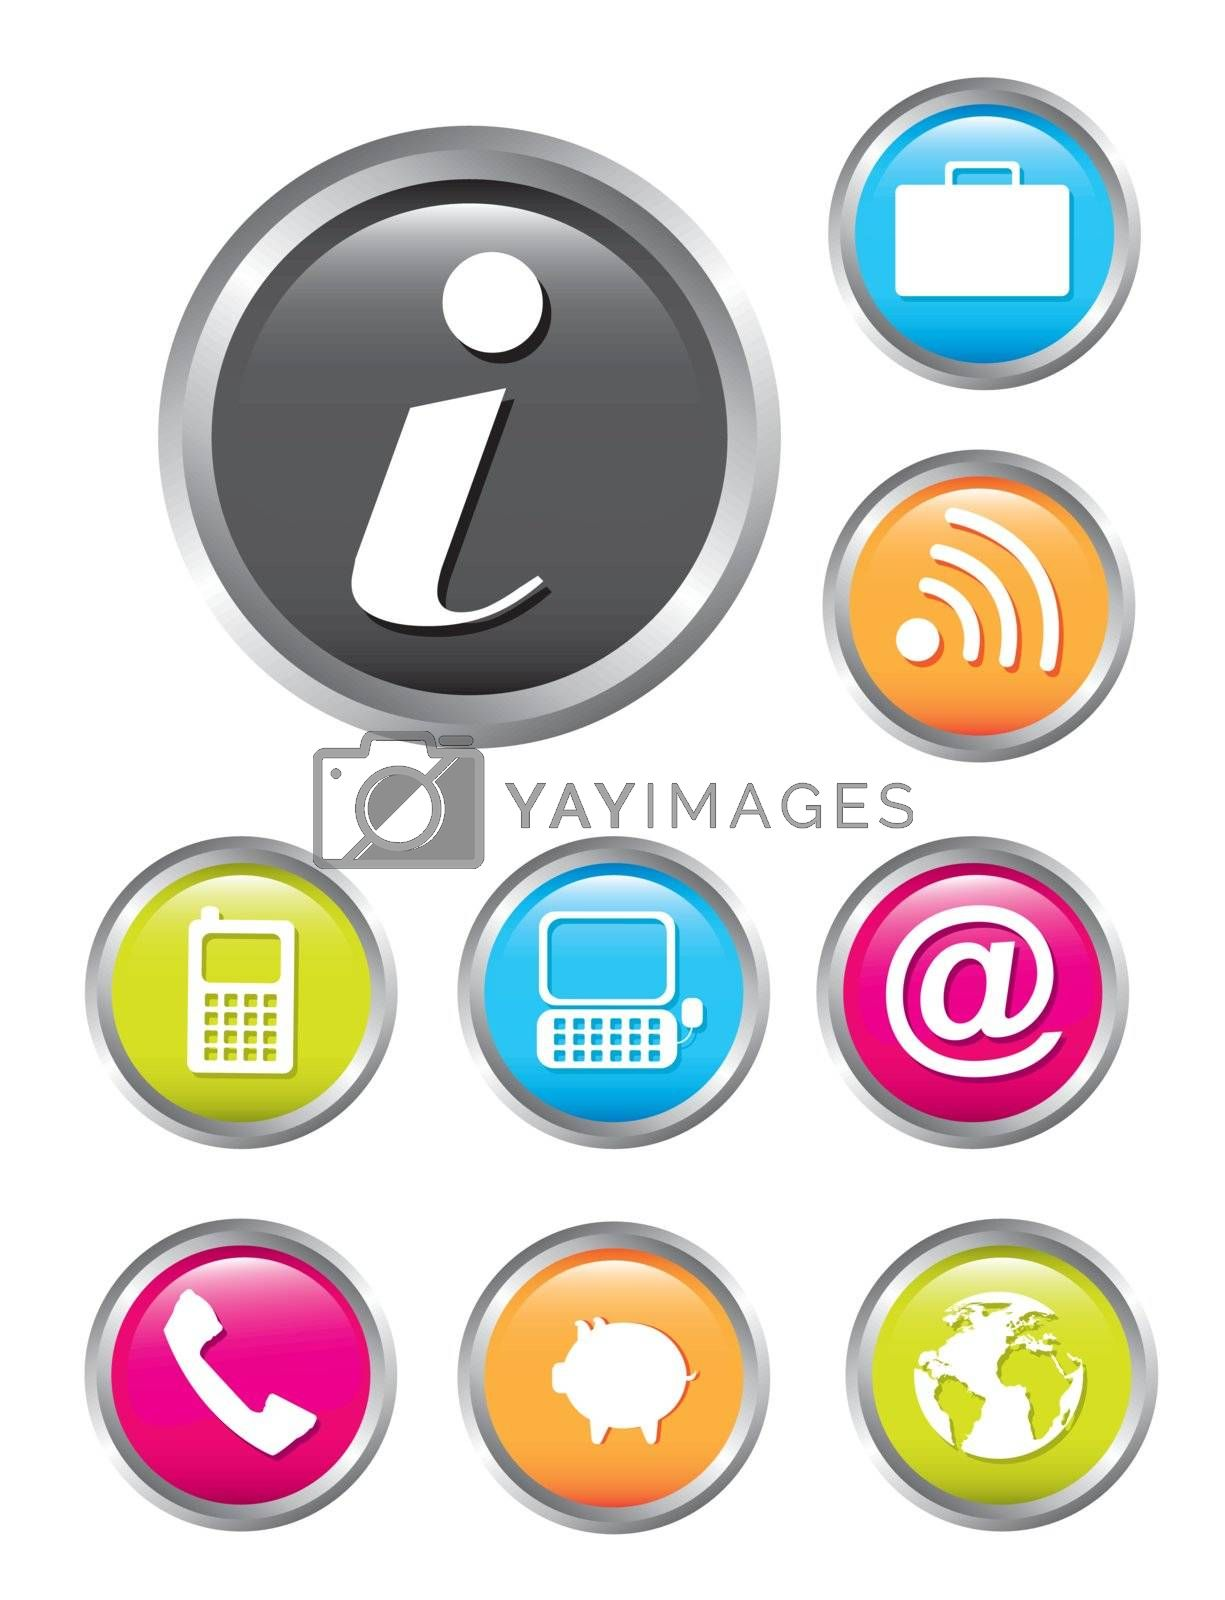 communication icons isolated over white background. vector illustration